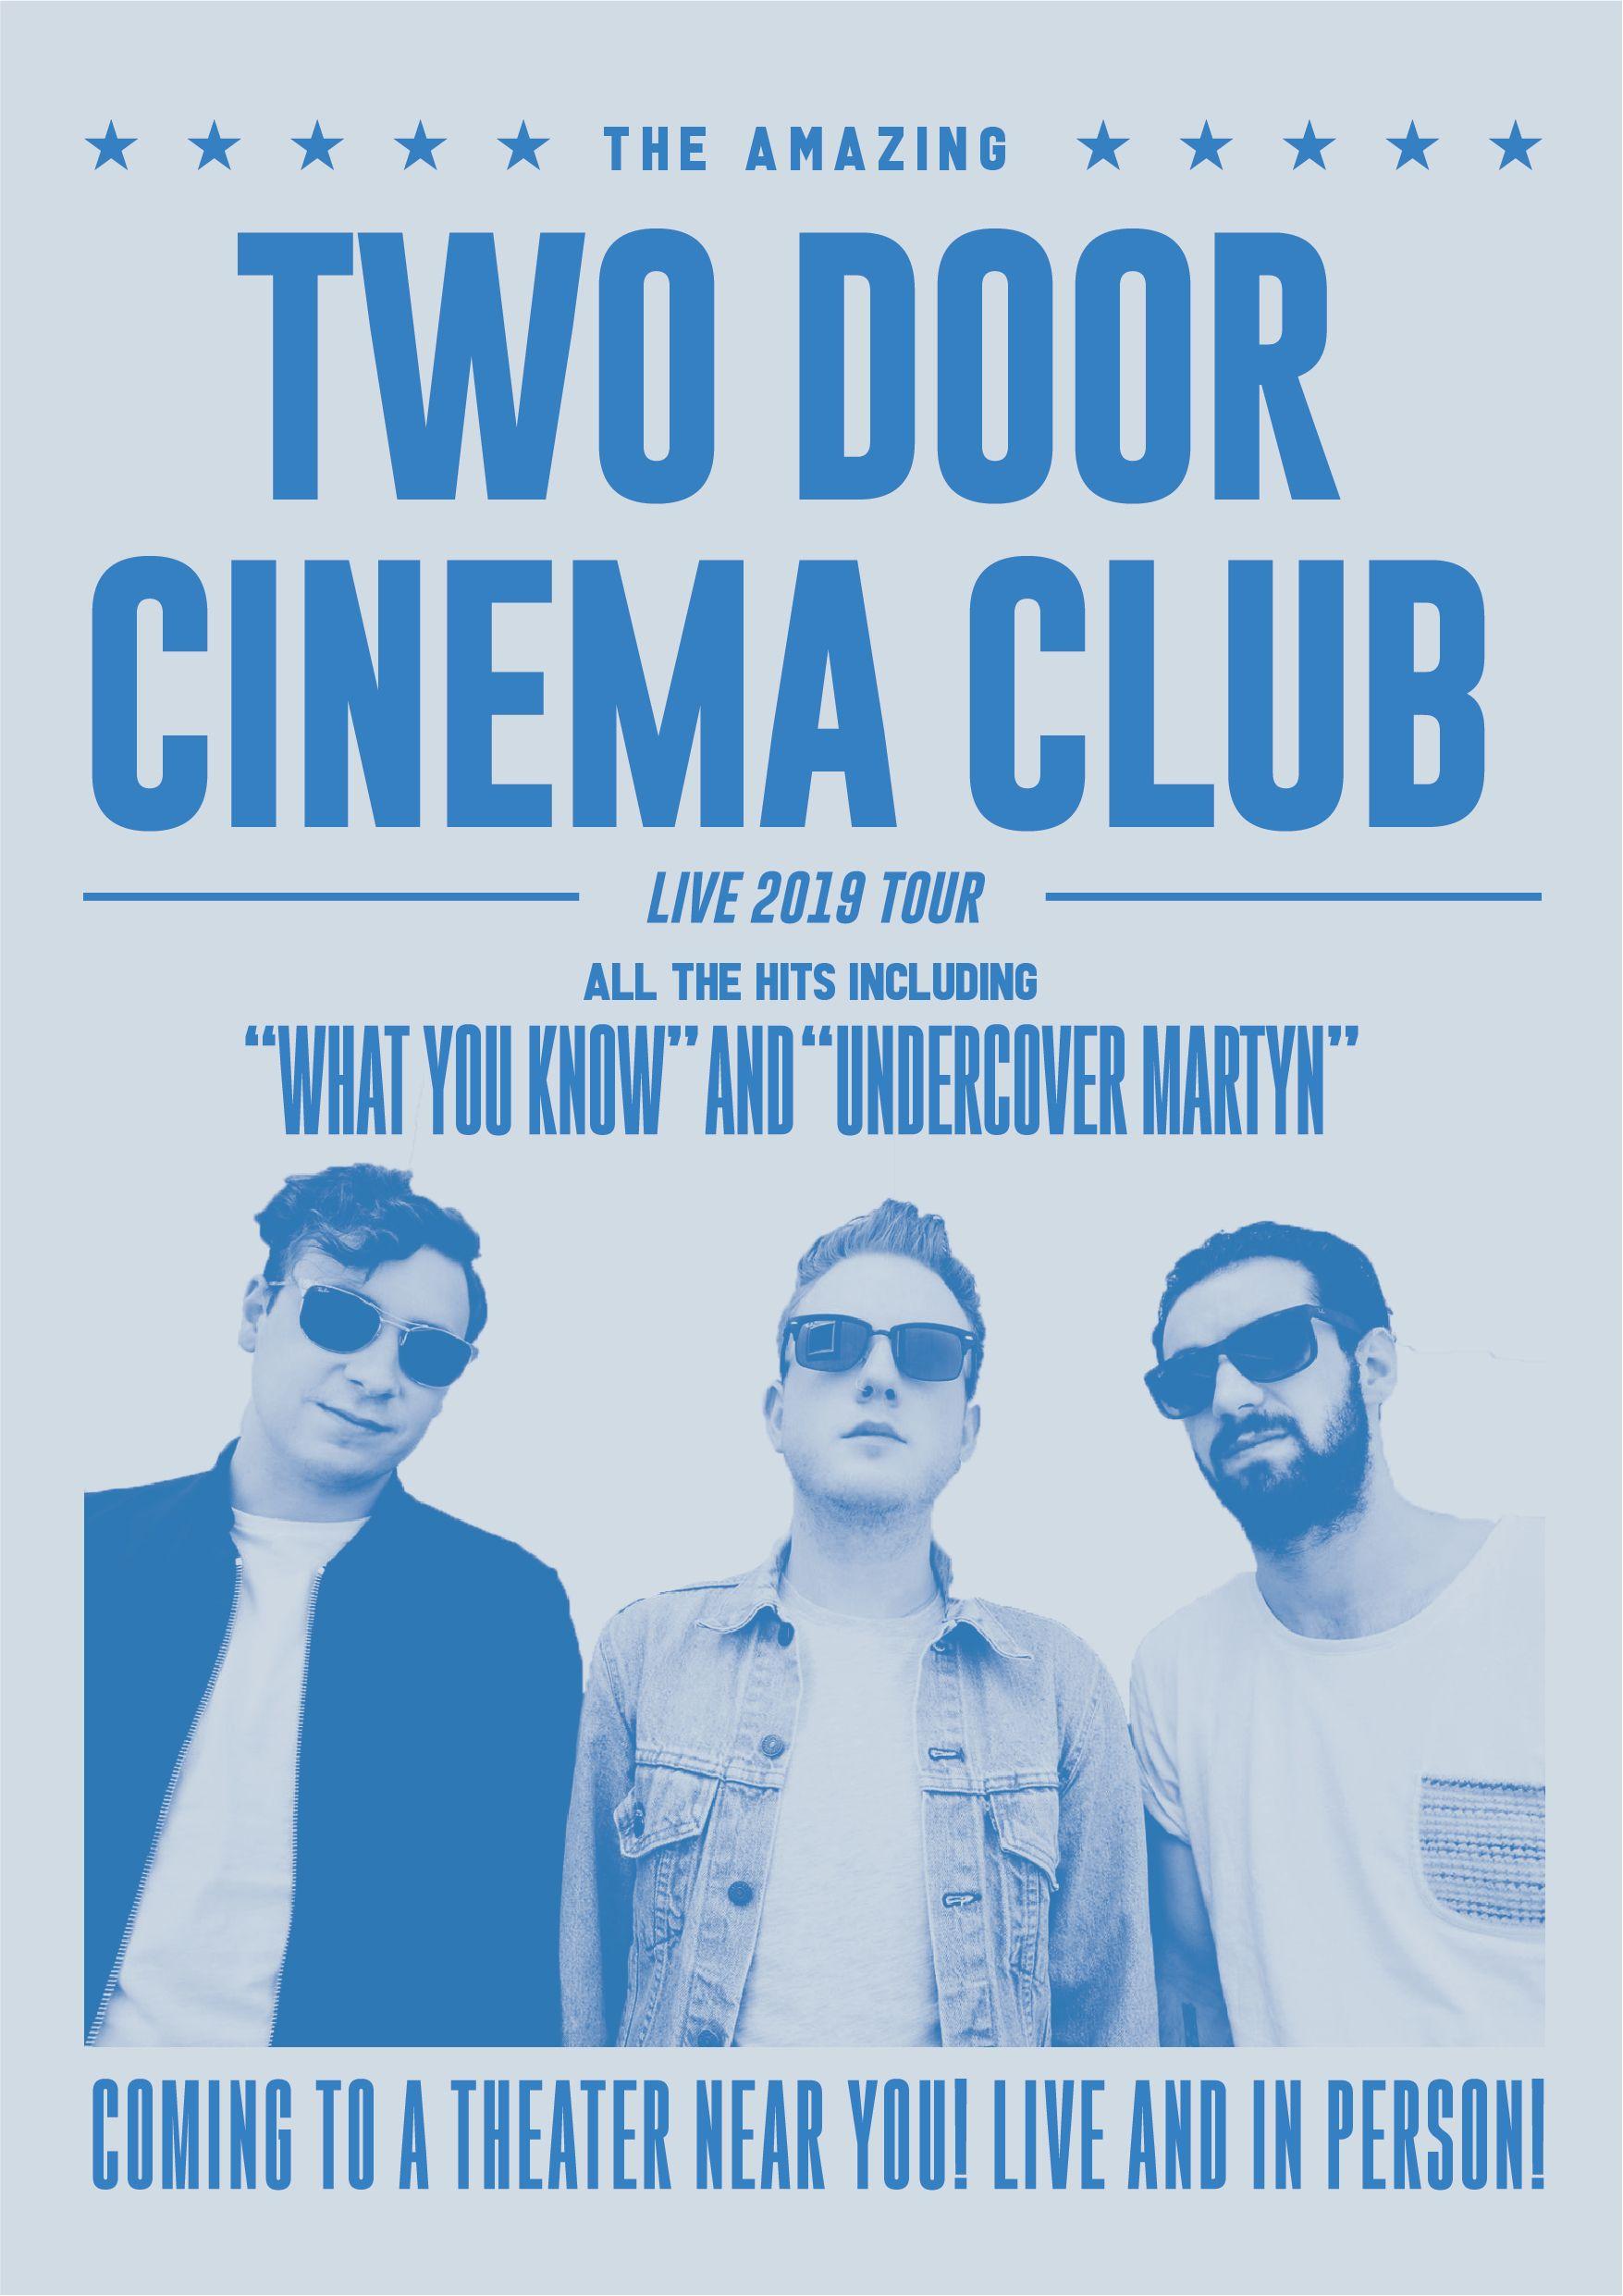 Two Door Cinema Club Retro Inspired 2019 Tour Poster Two Door Cinema Club Music Poster Tour Posters